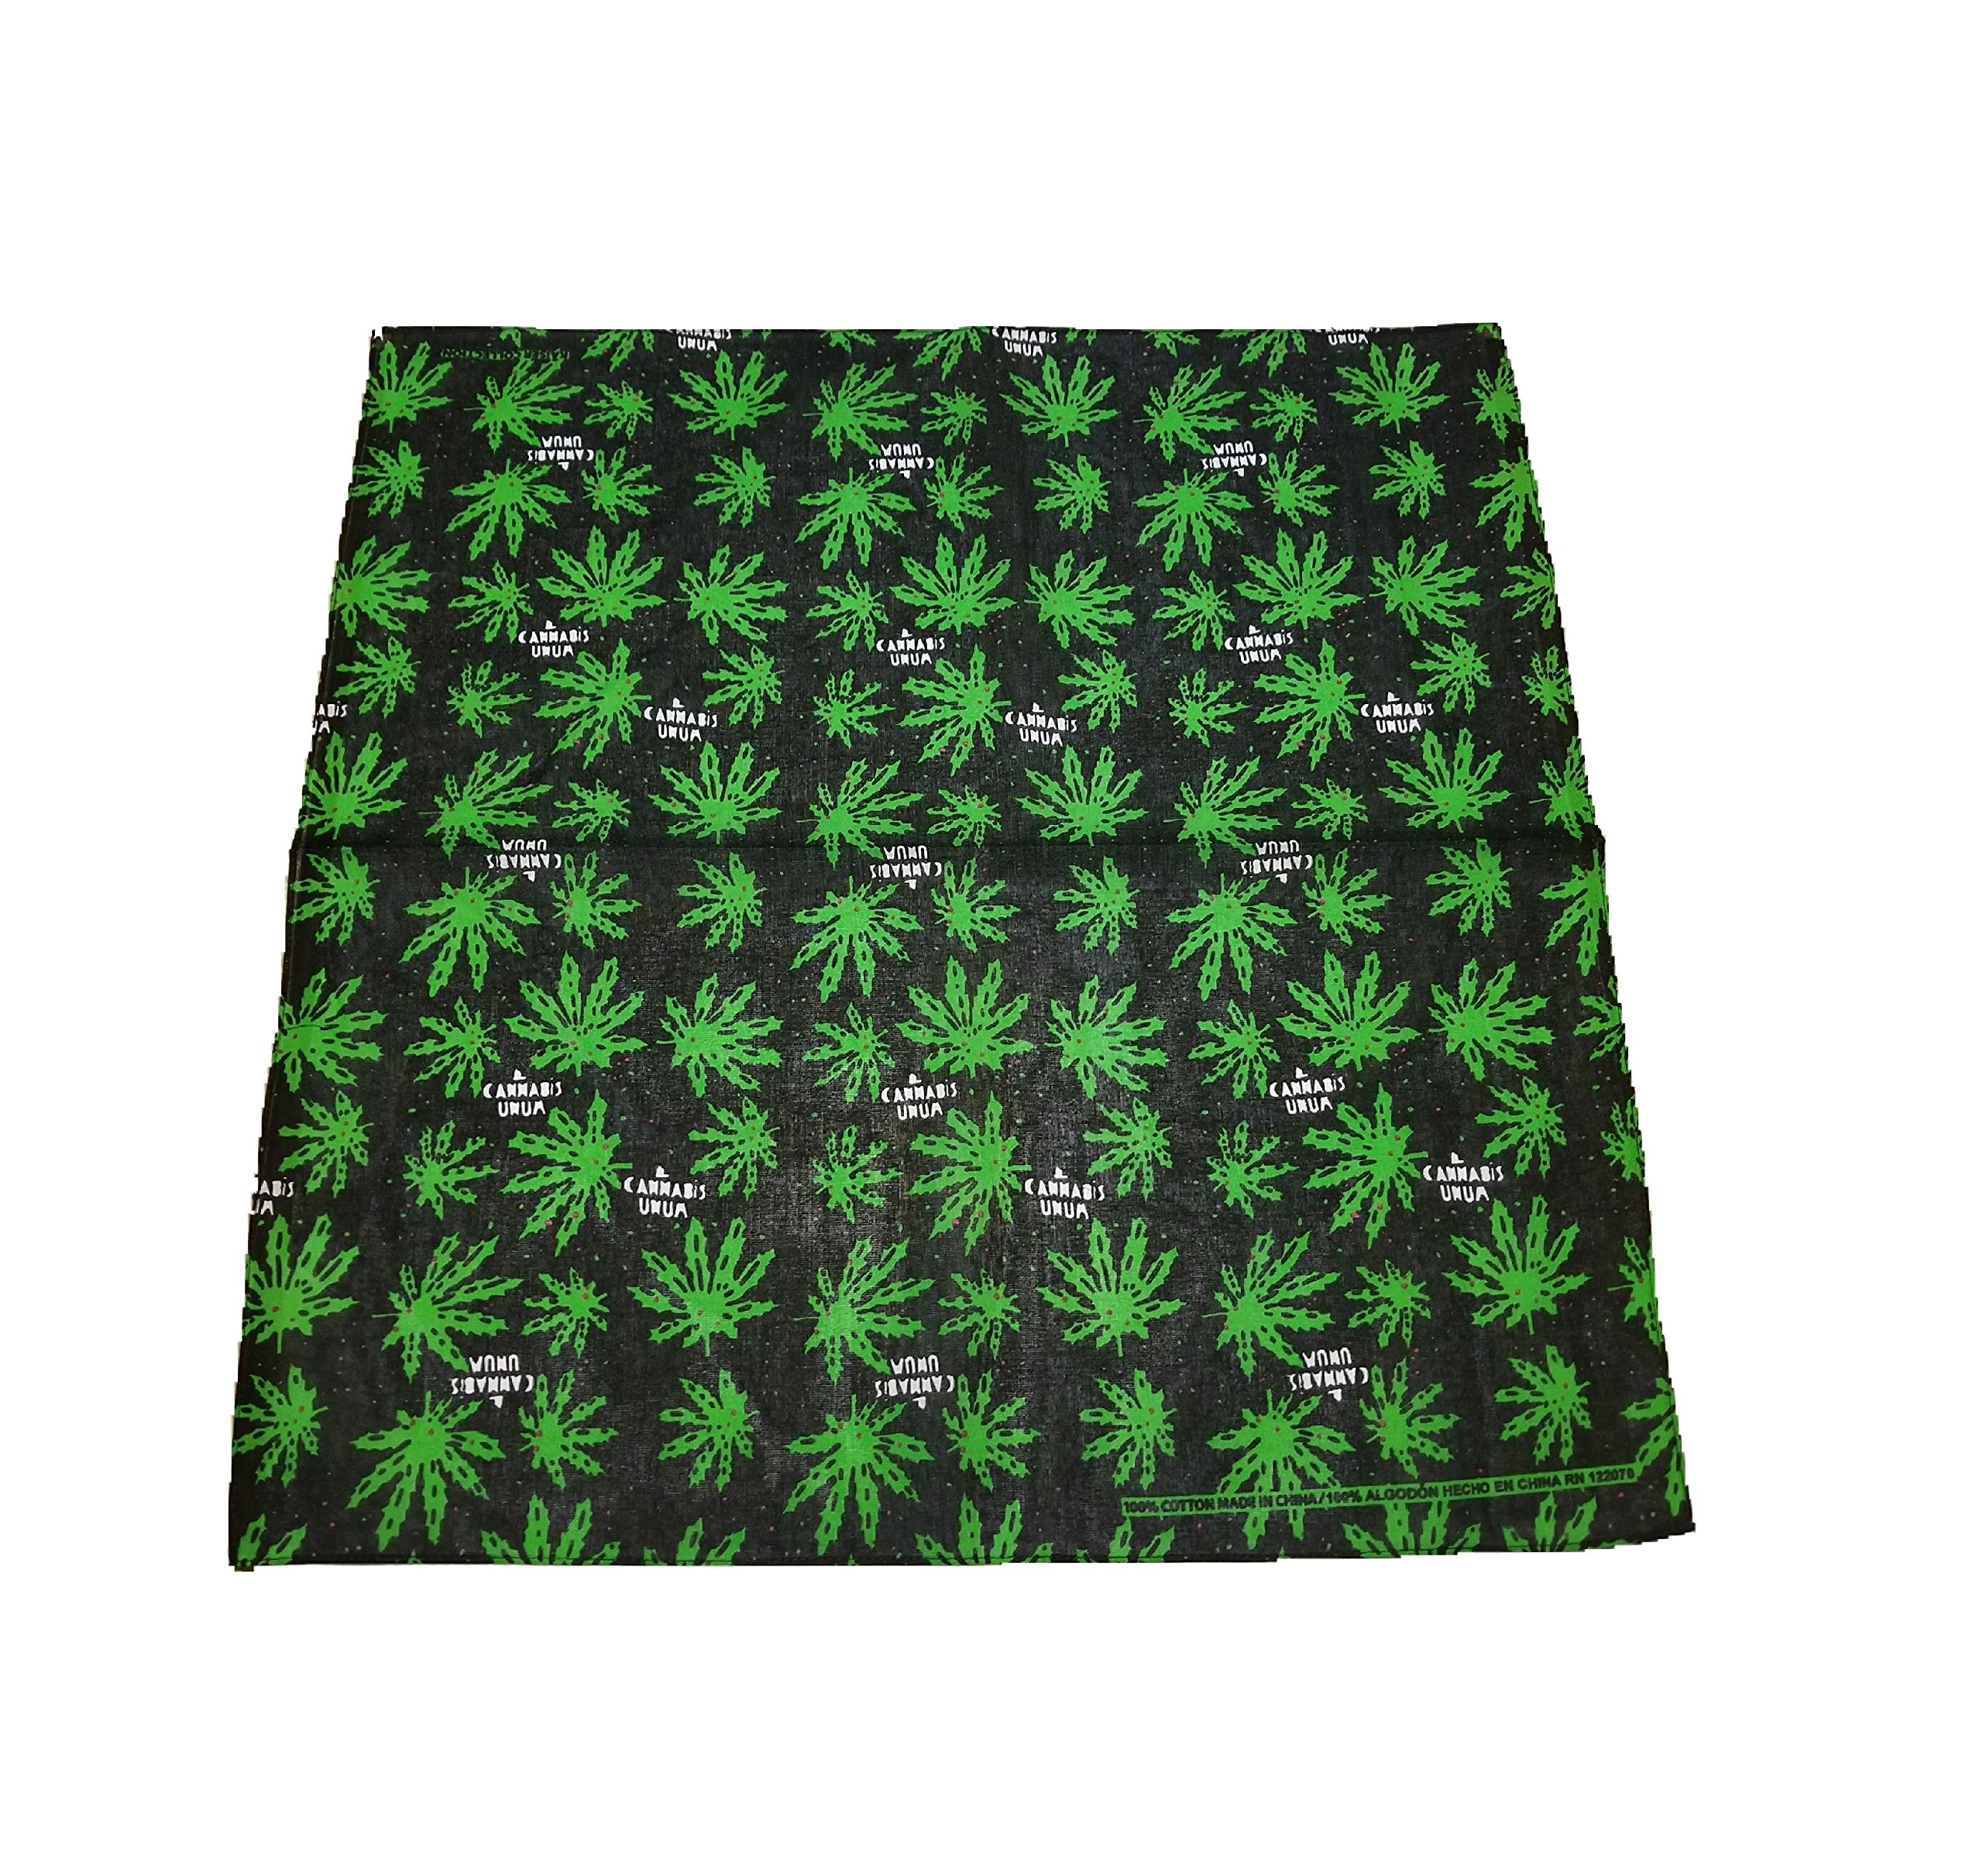 Weed Leaf Pot Cannabis Marijuana Bandana Biker DURAG Head WRAP Scarf Large 22 X 22 Green, Black